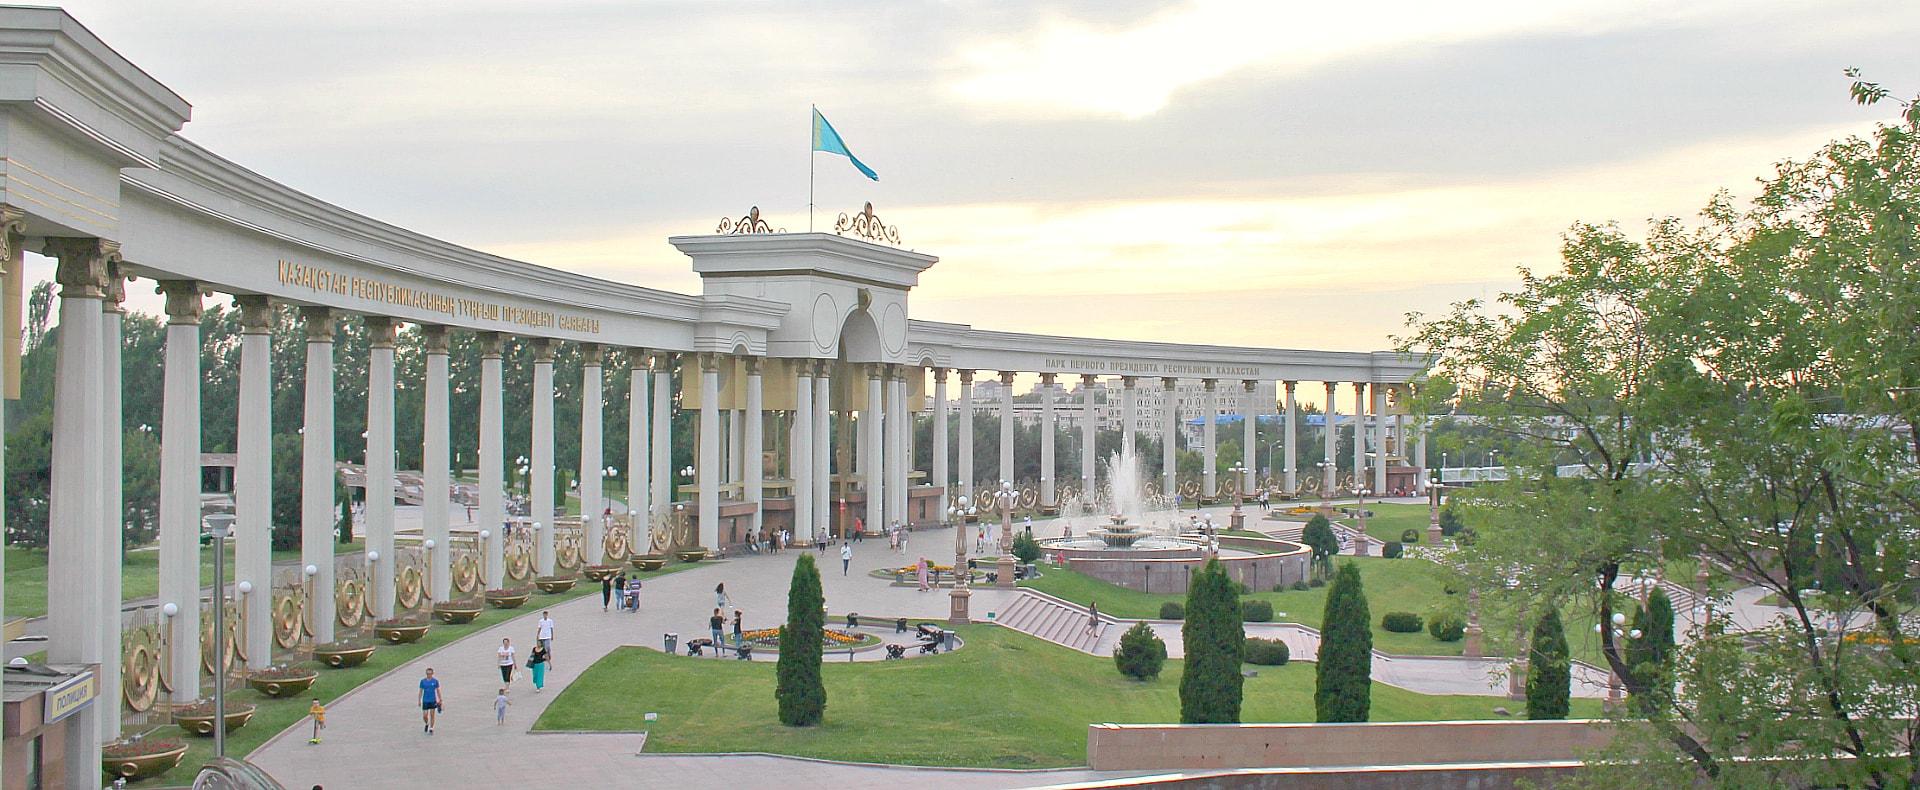 Almaty City Gallery